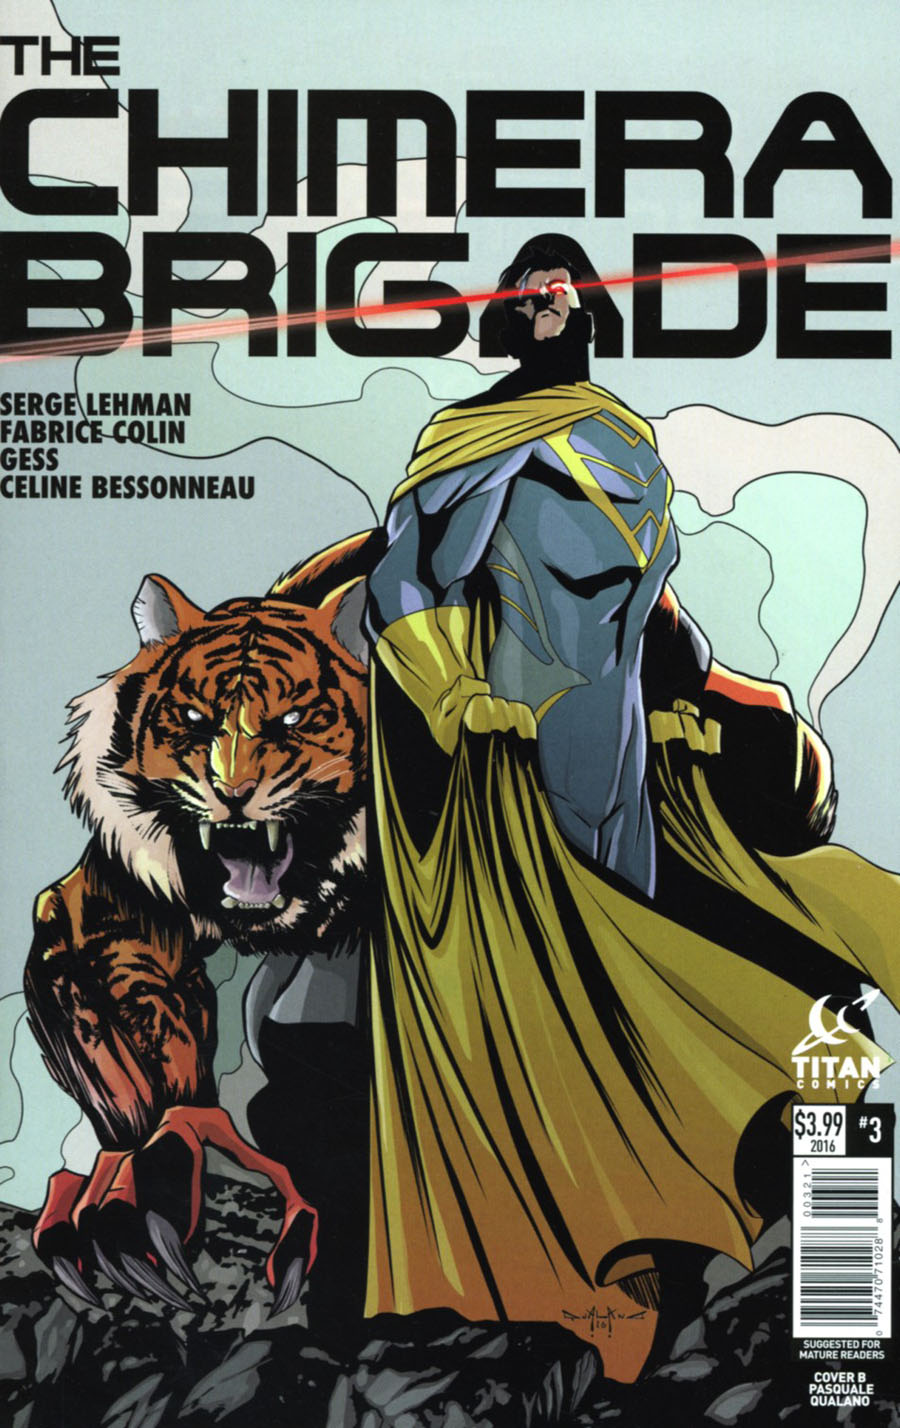 Chimera Brigade #3 Cover B Variant Pasquale Qualano Cover